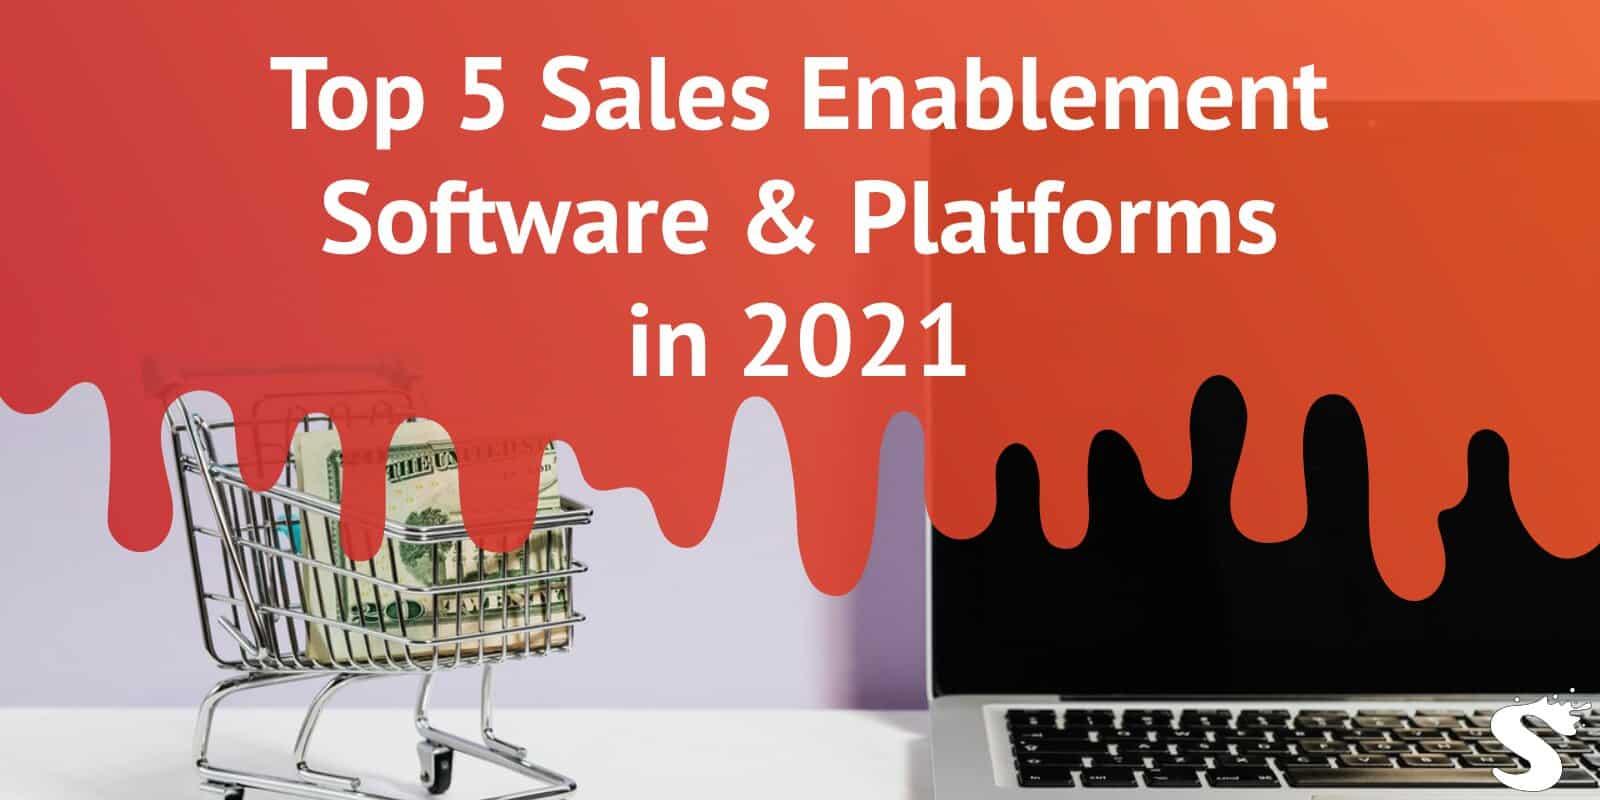 Top 5 Sales Enablement Software & Platforms in 2021